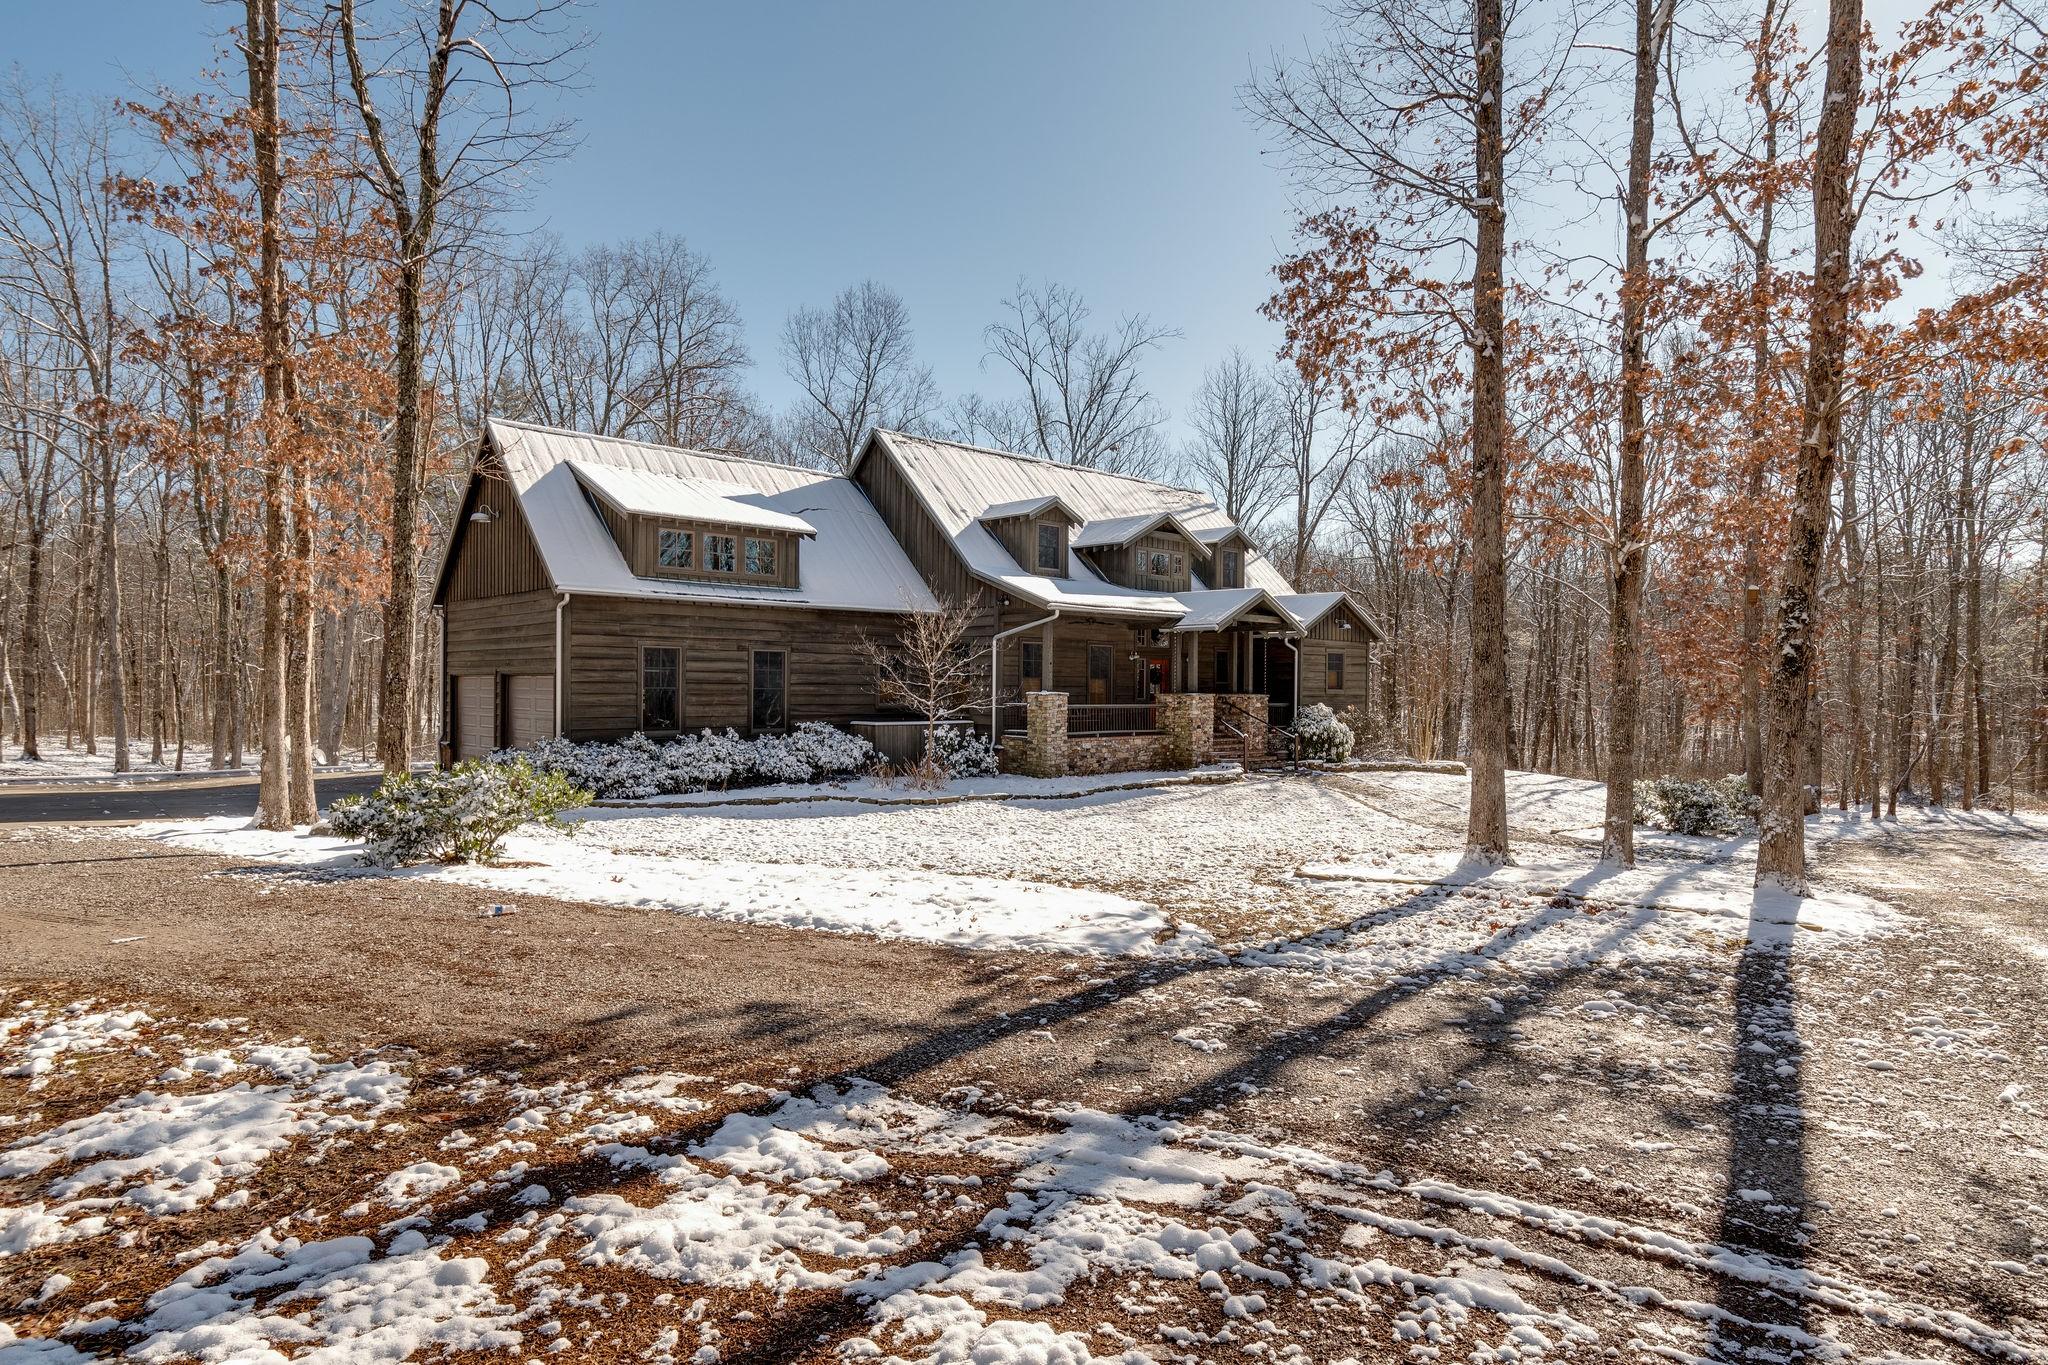 1705 Timberwood Trace, Monteagle, TN 37356 - Monteagle, TN real estate listing